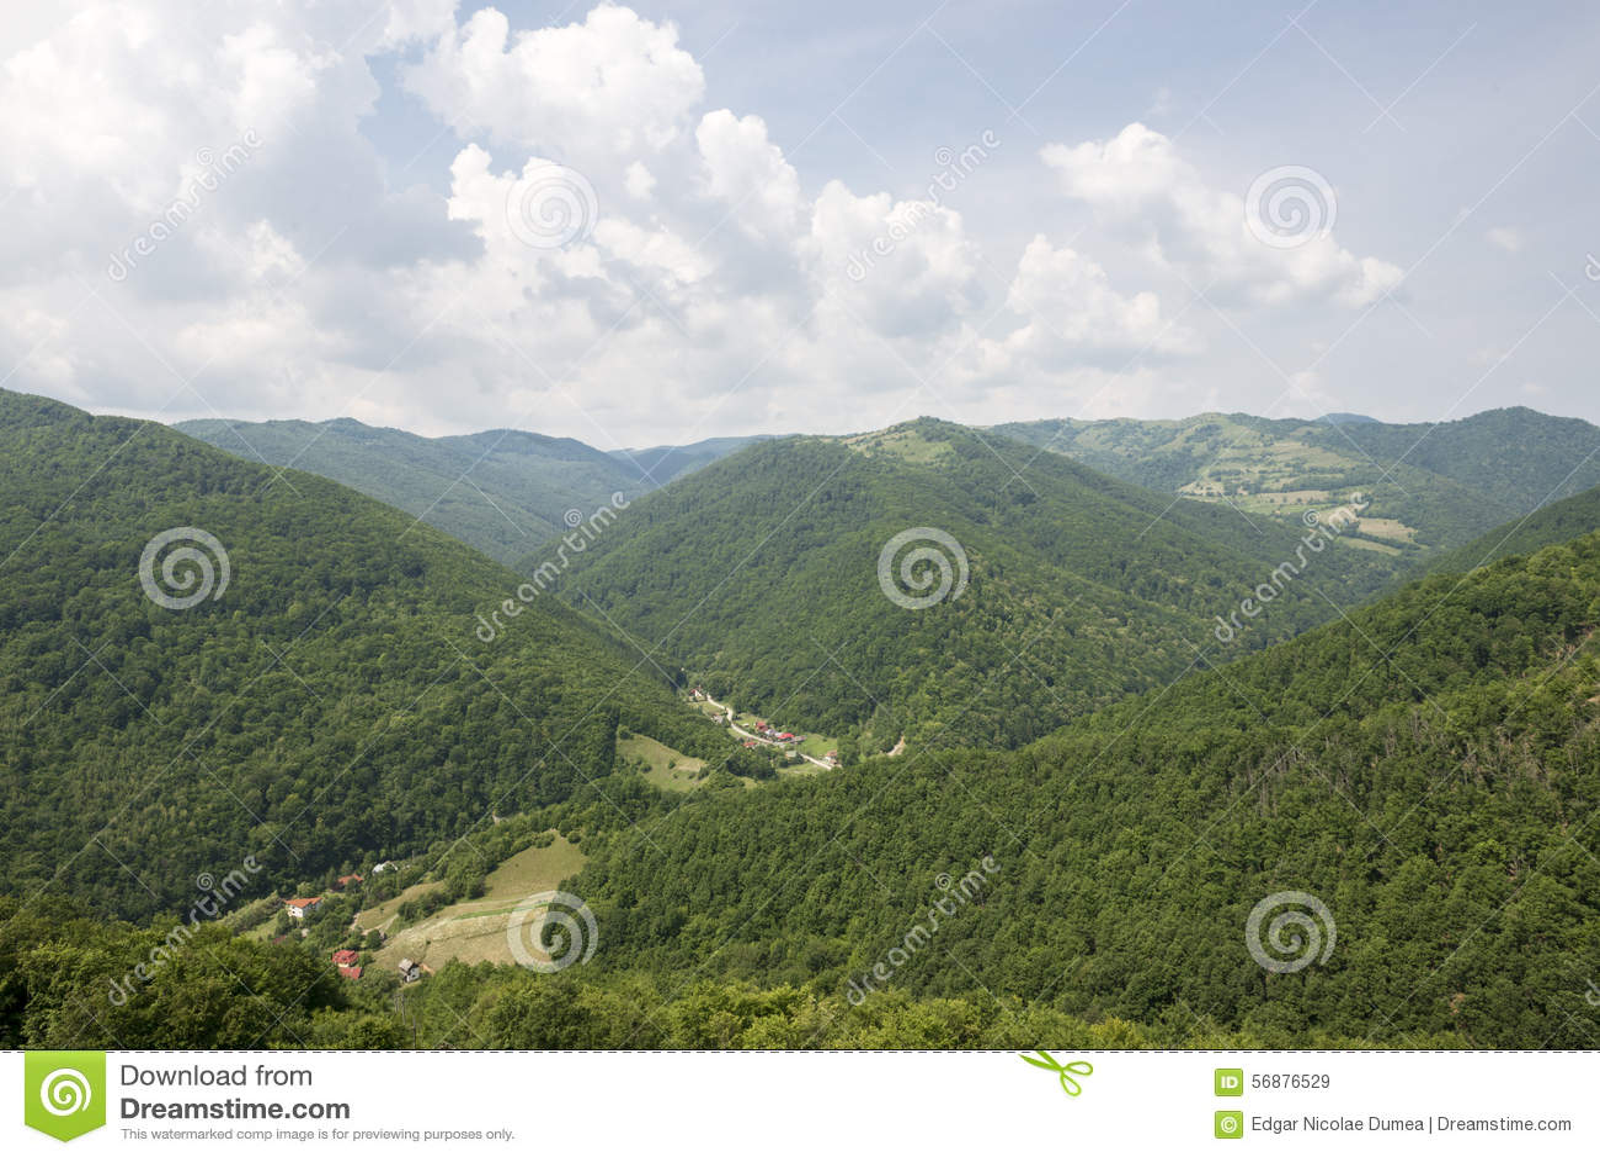 Camere in una valle verde